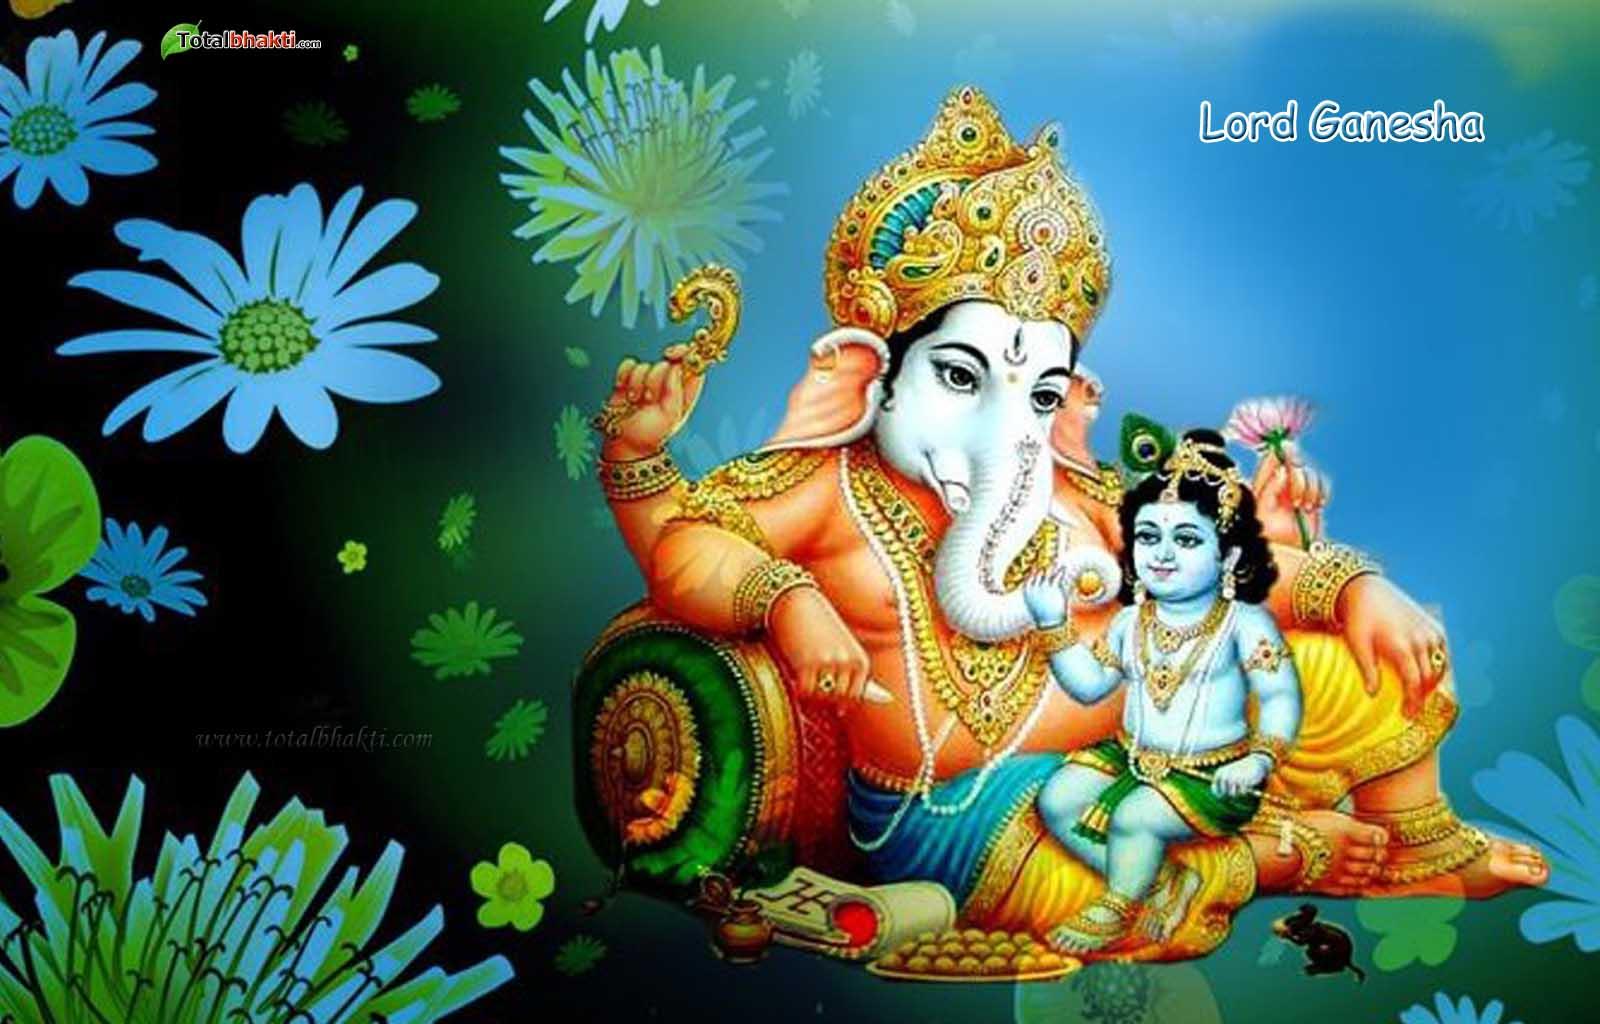 HariHarji: Spiritual Calendar: August 2013